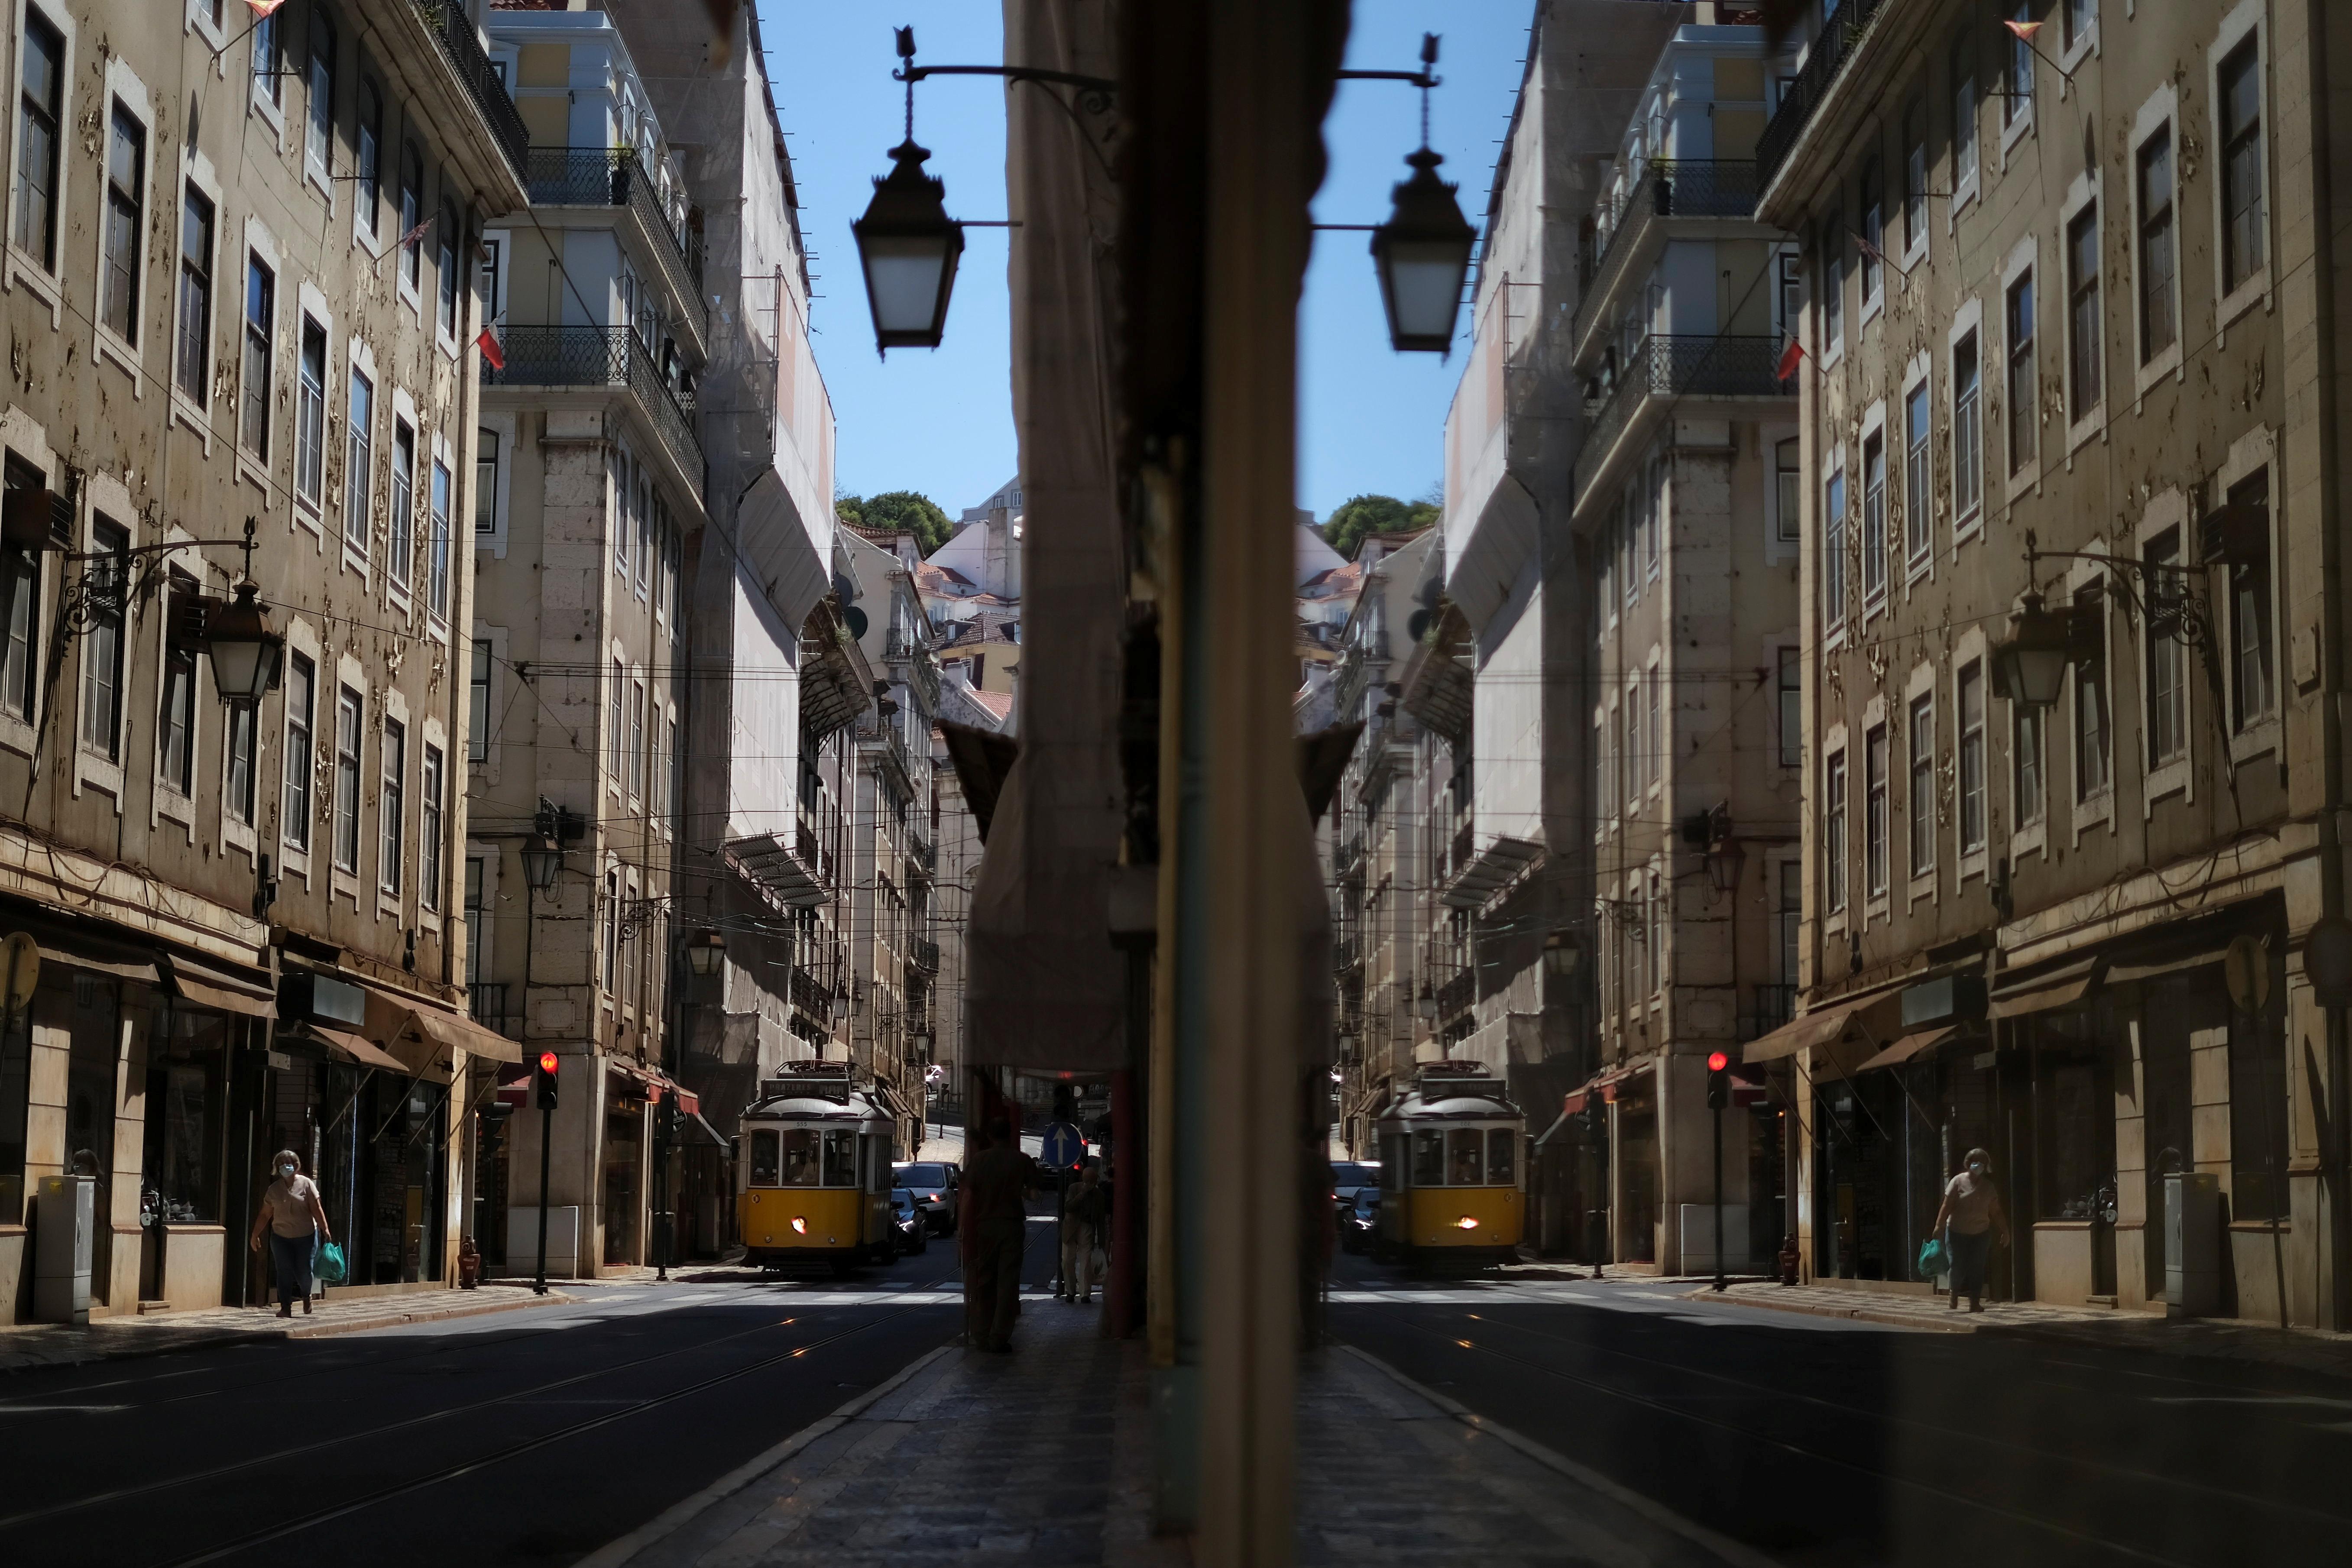 Lisbon downtown amid the coronavirus disease (COVID-19) pandemic, in Lisbon, Portugal, June 24, 2021. REUTERS/Pedro Nunes